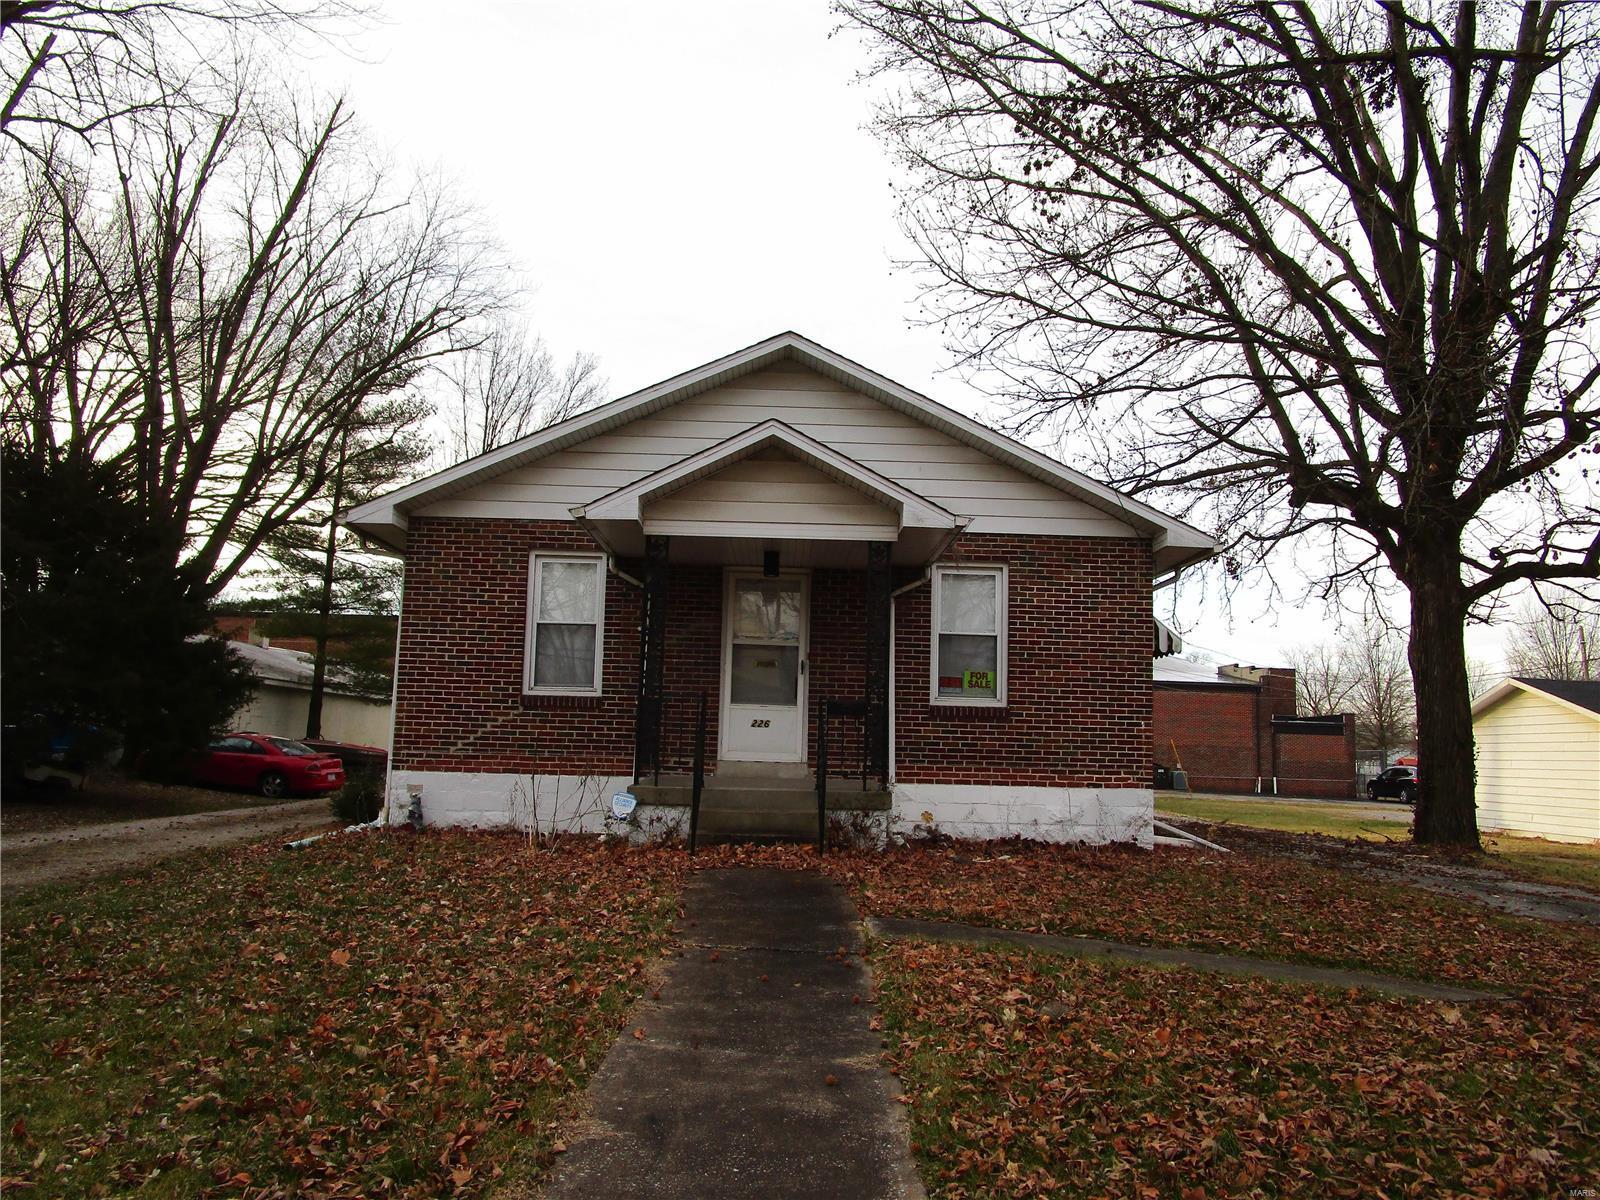 226 E Lyons Property Photo - Marissa, IL real estate listing